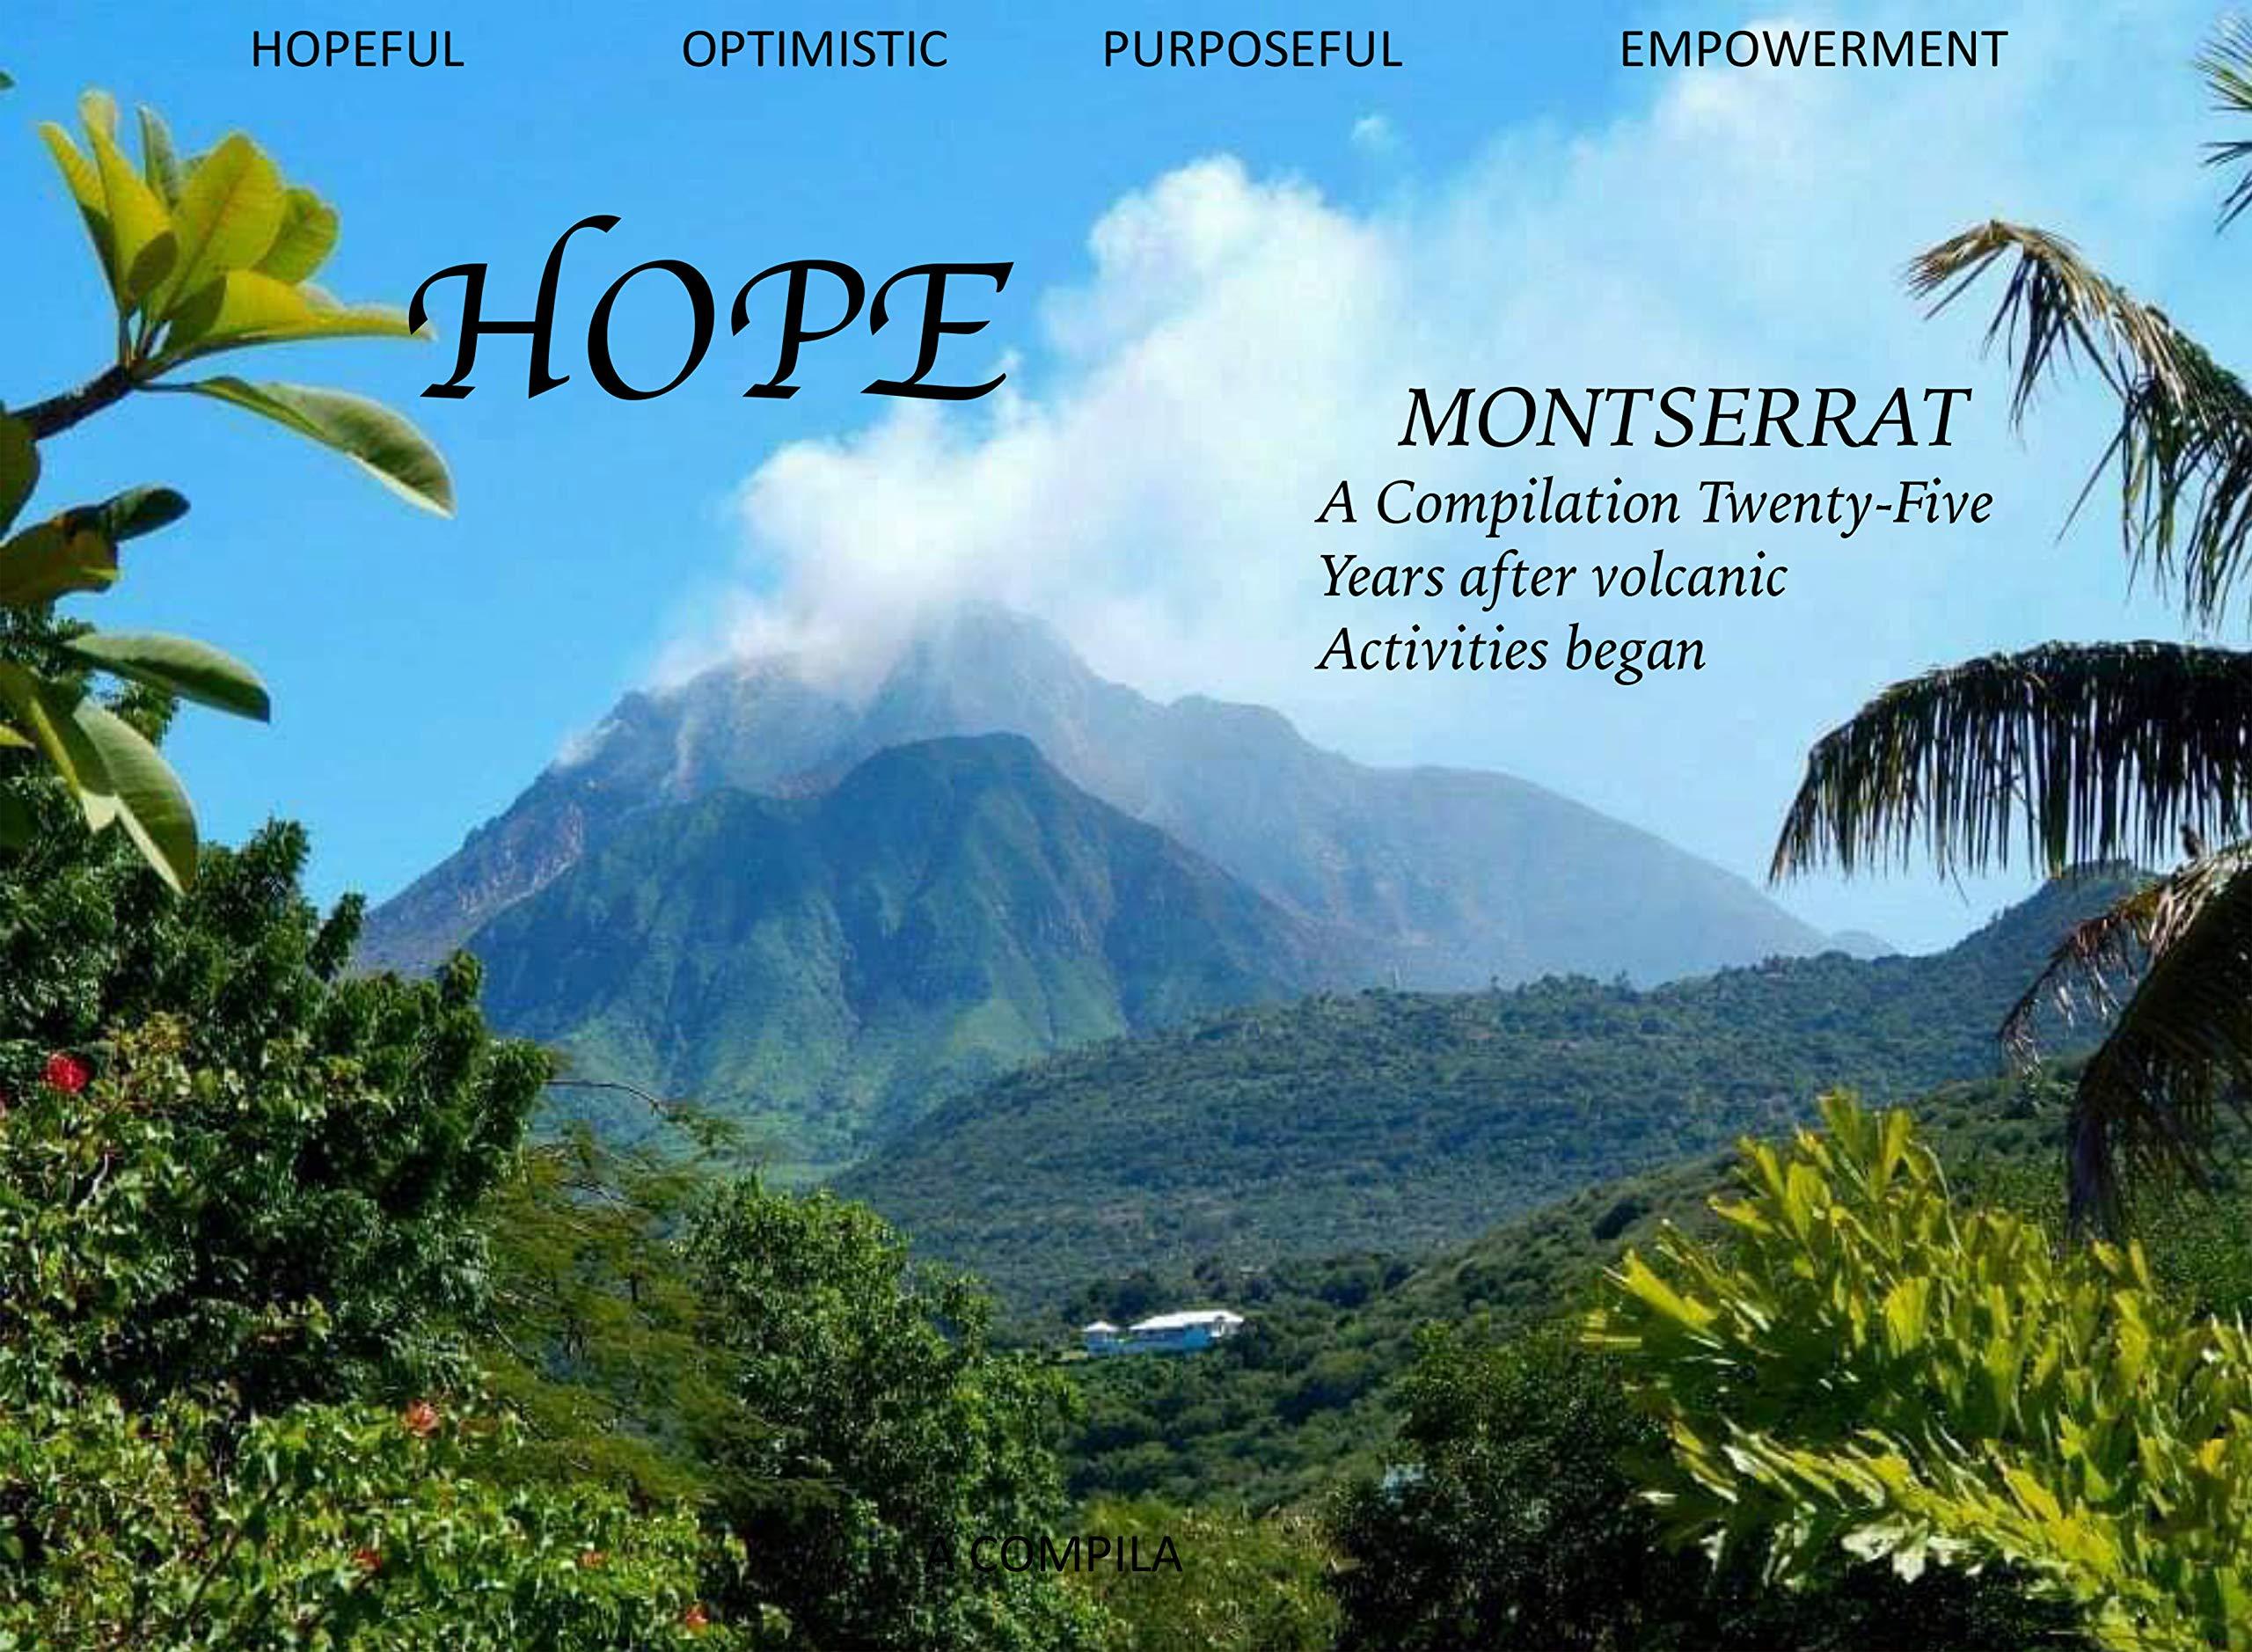 HOPE : :Compilation For Montserrat Twenty-Five Years After Volcanic Eruptions